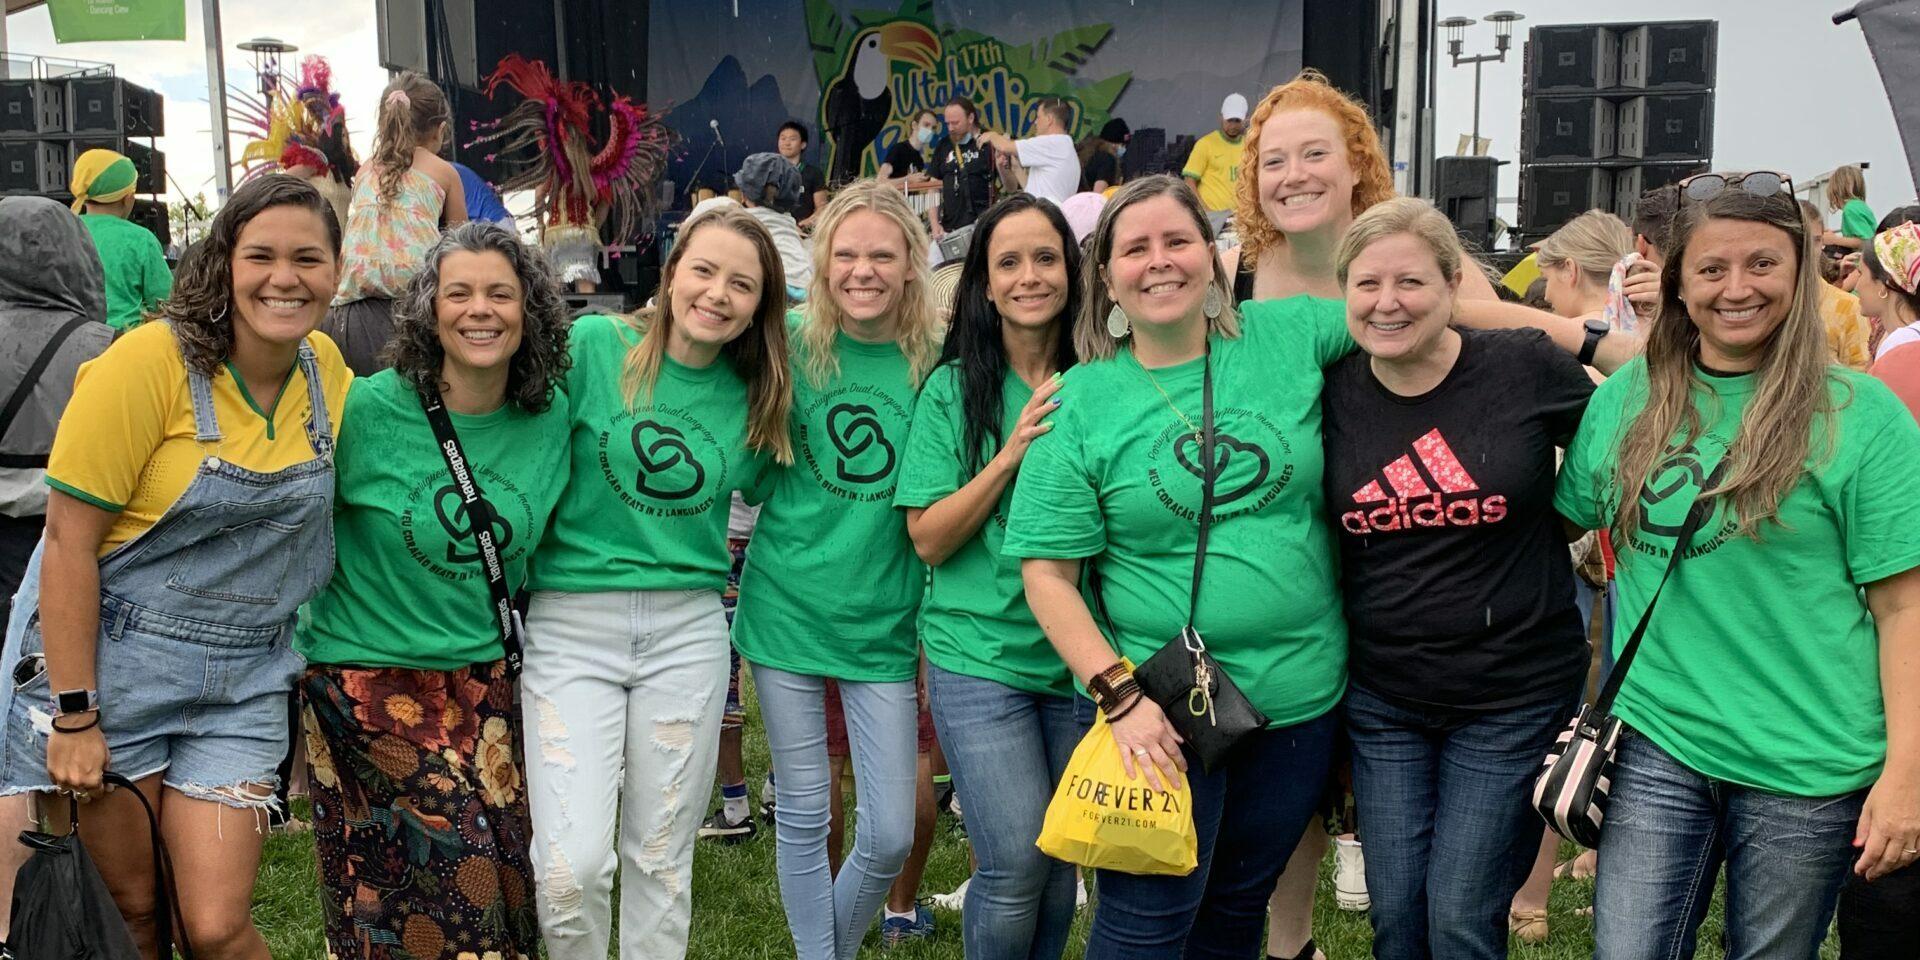 Teachers wearing green shirts.